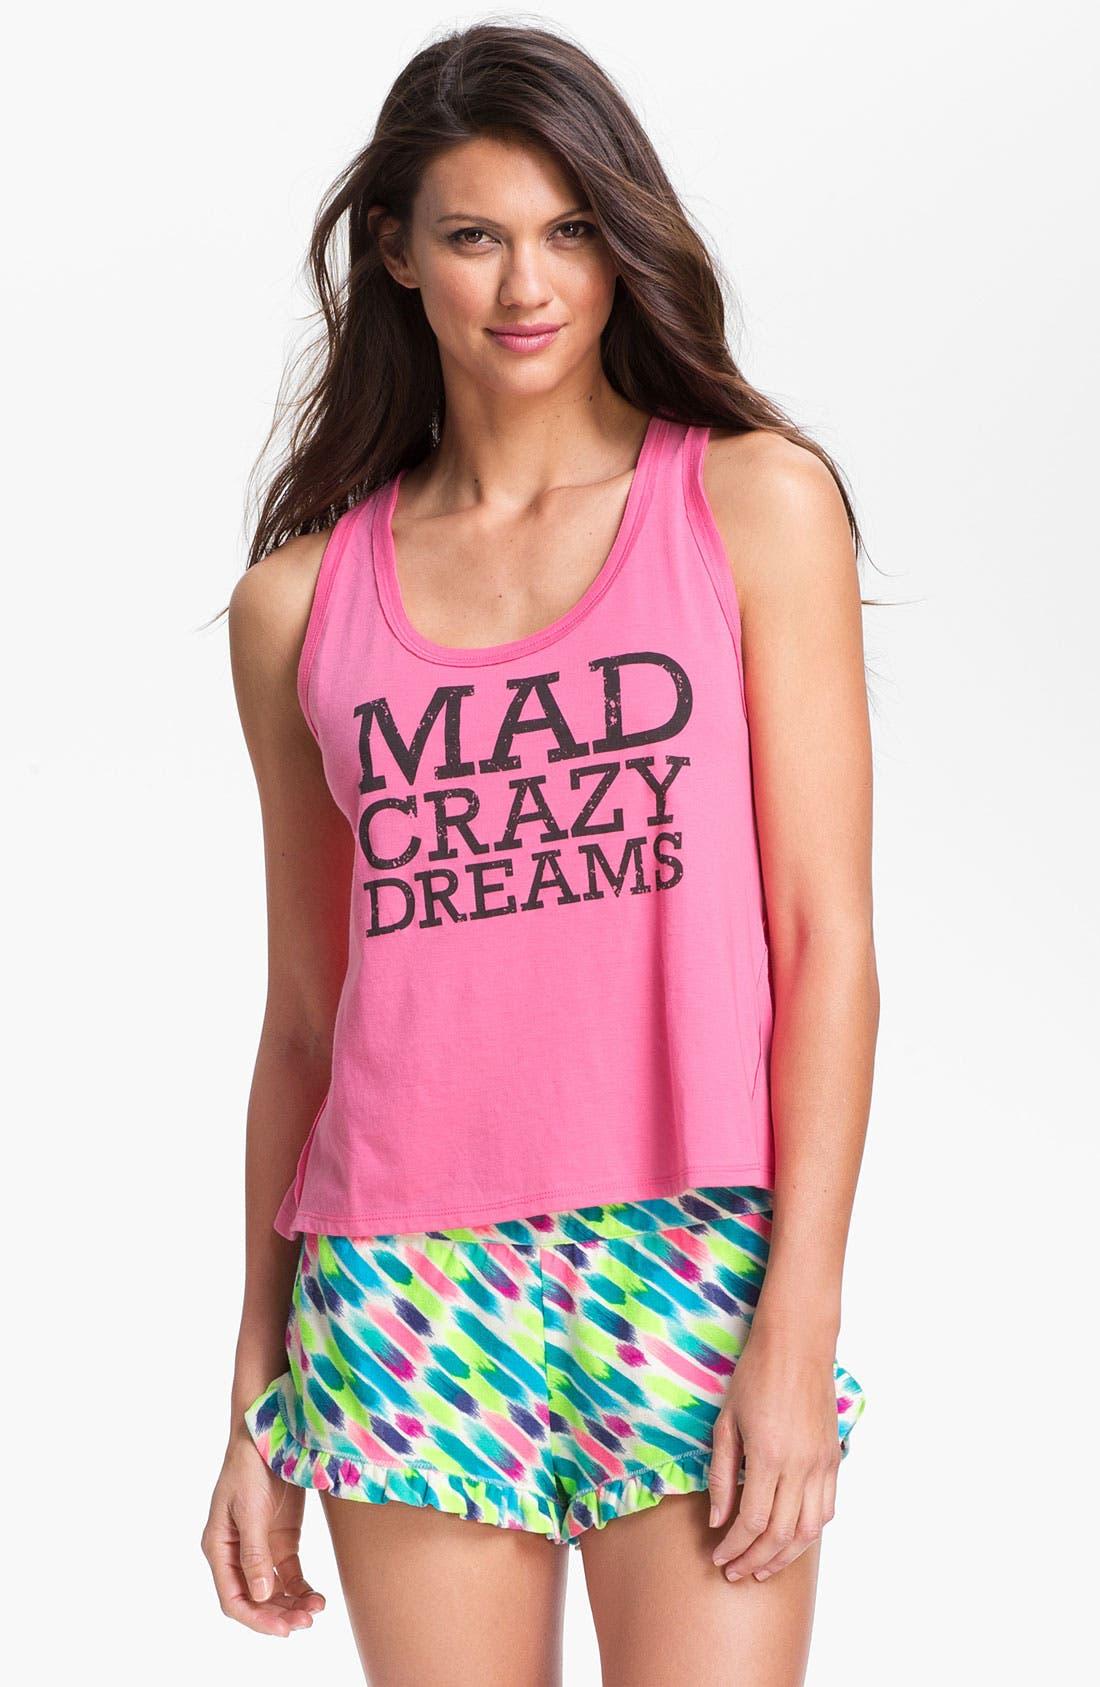 Alternate Image 1 Selected - Steve Madden 'Mad Crazy Dreams' Tank